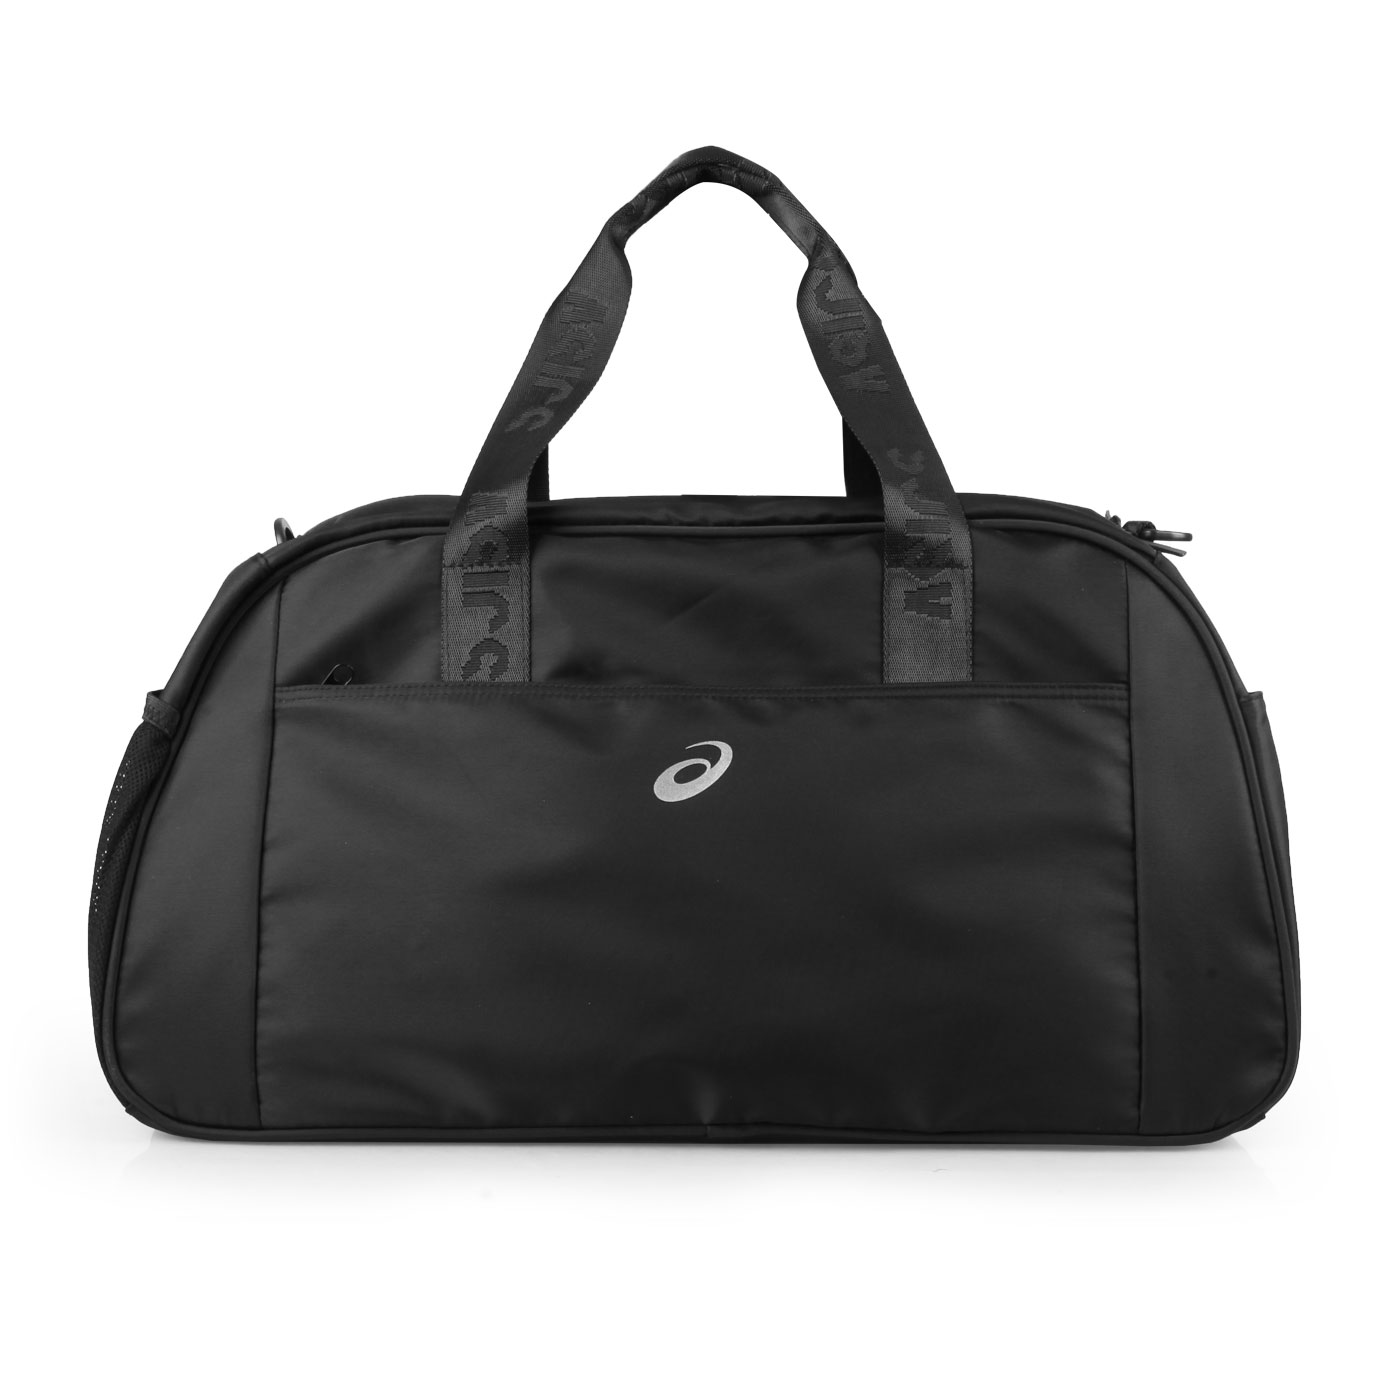 ASICS 大型旅行袋 3033A548-001